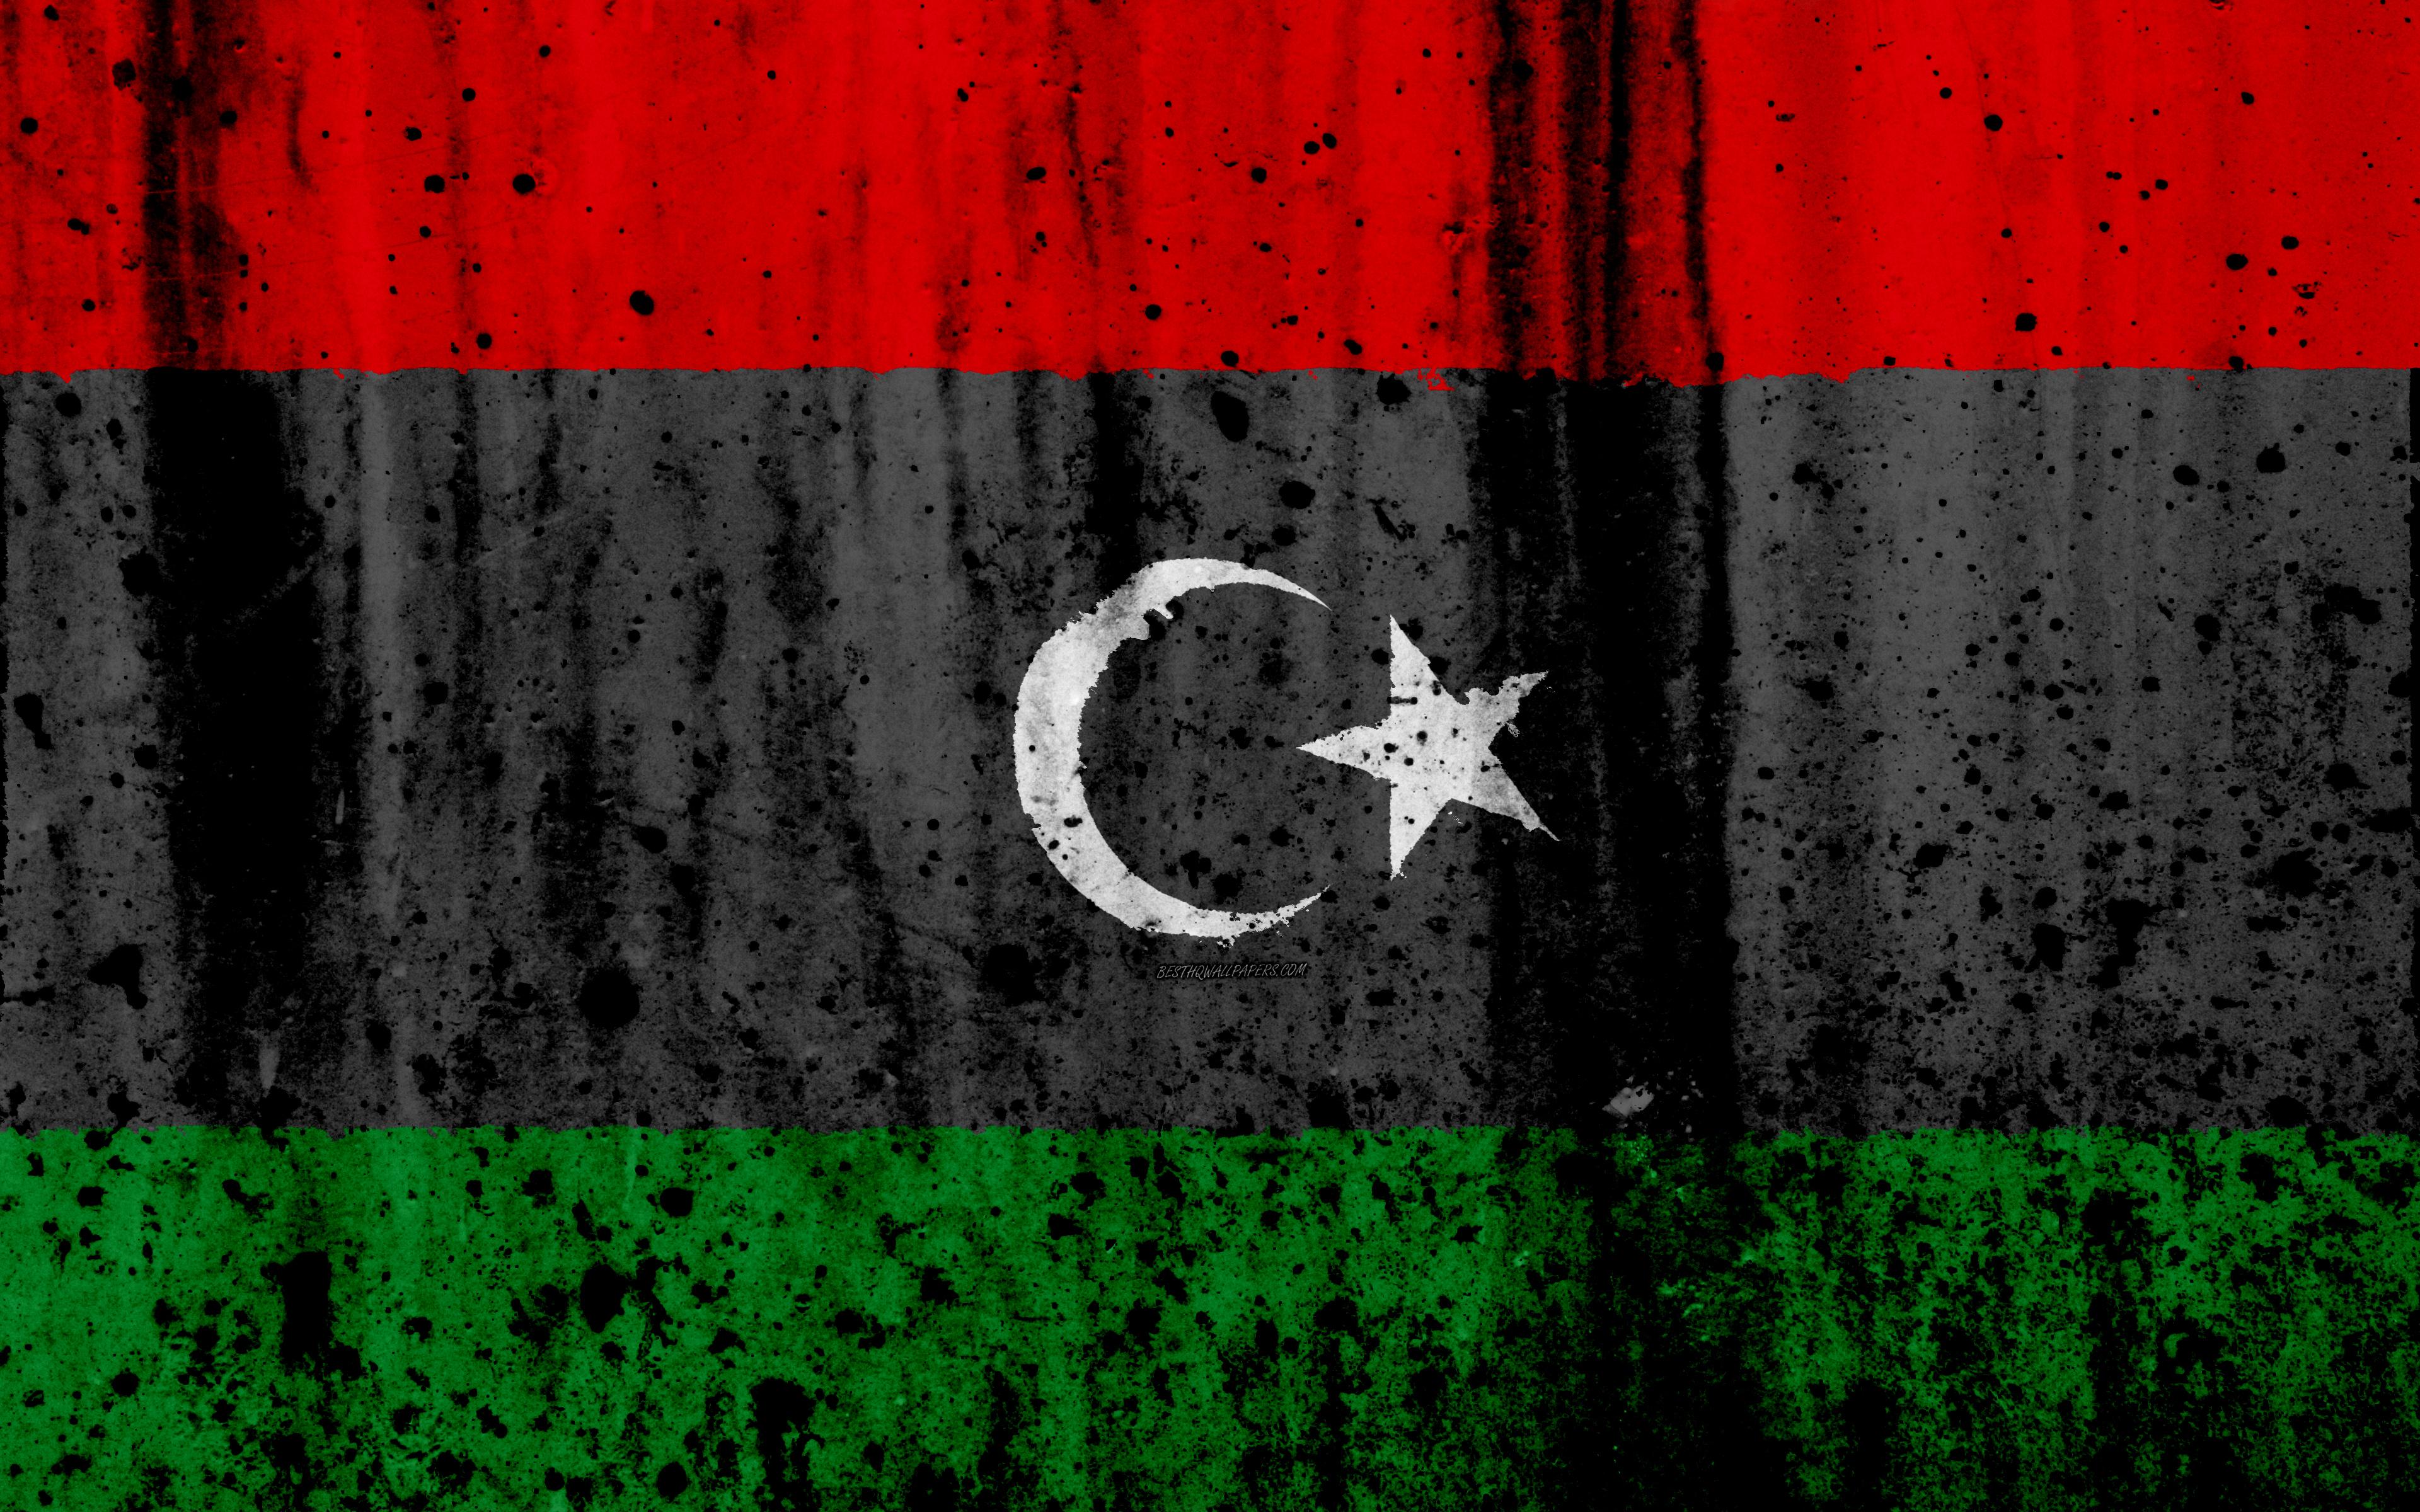 Download wallpapers Libyan flag, 4k, grunge, flag of Libya, Africa ...